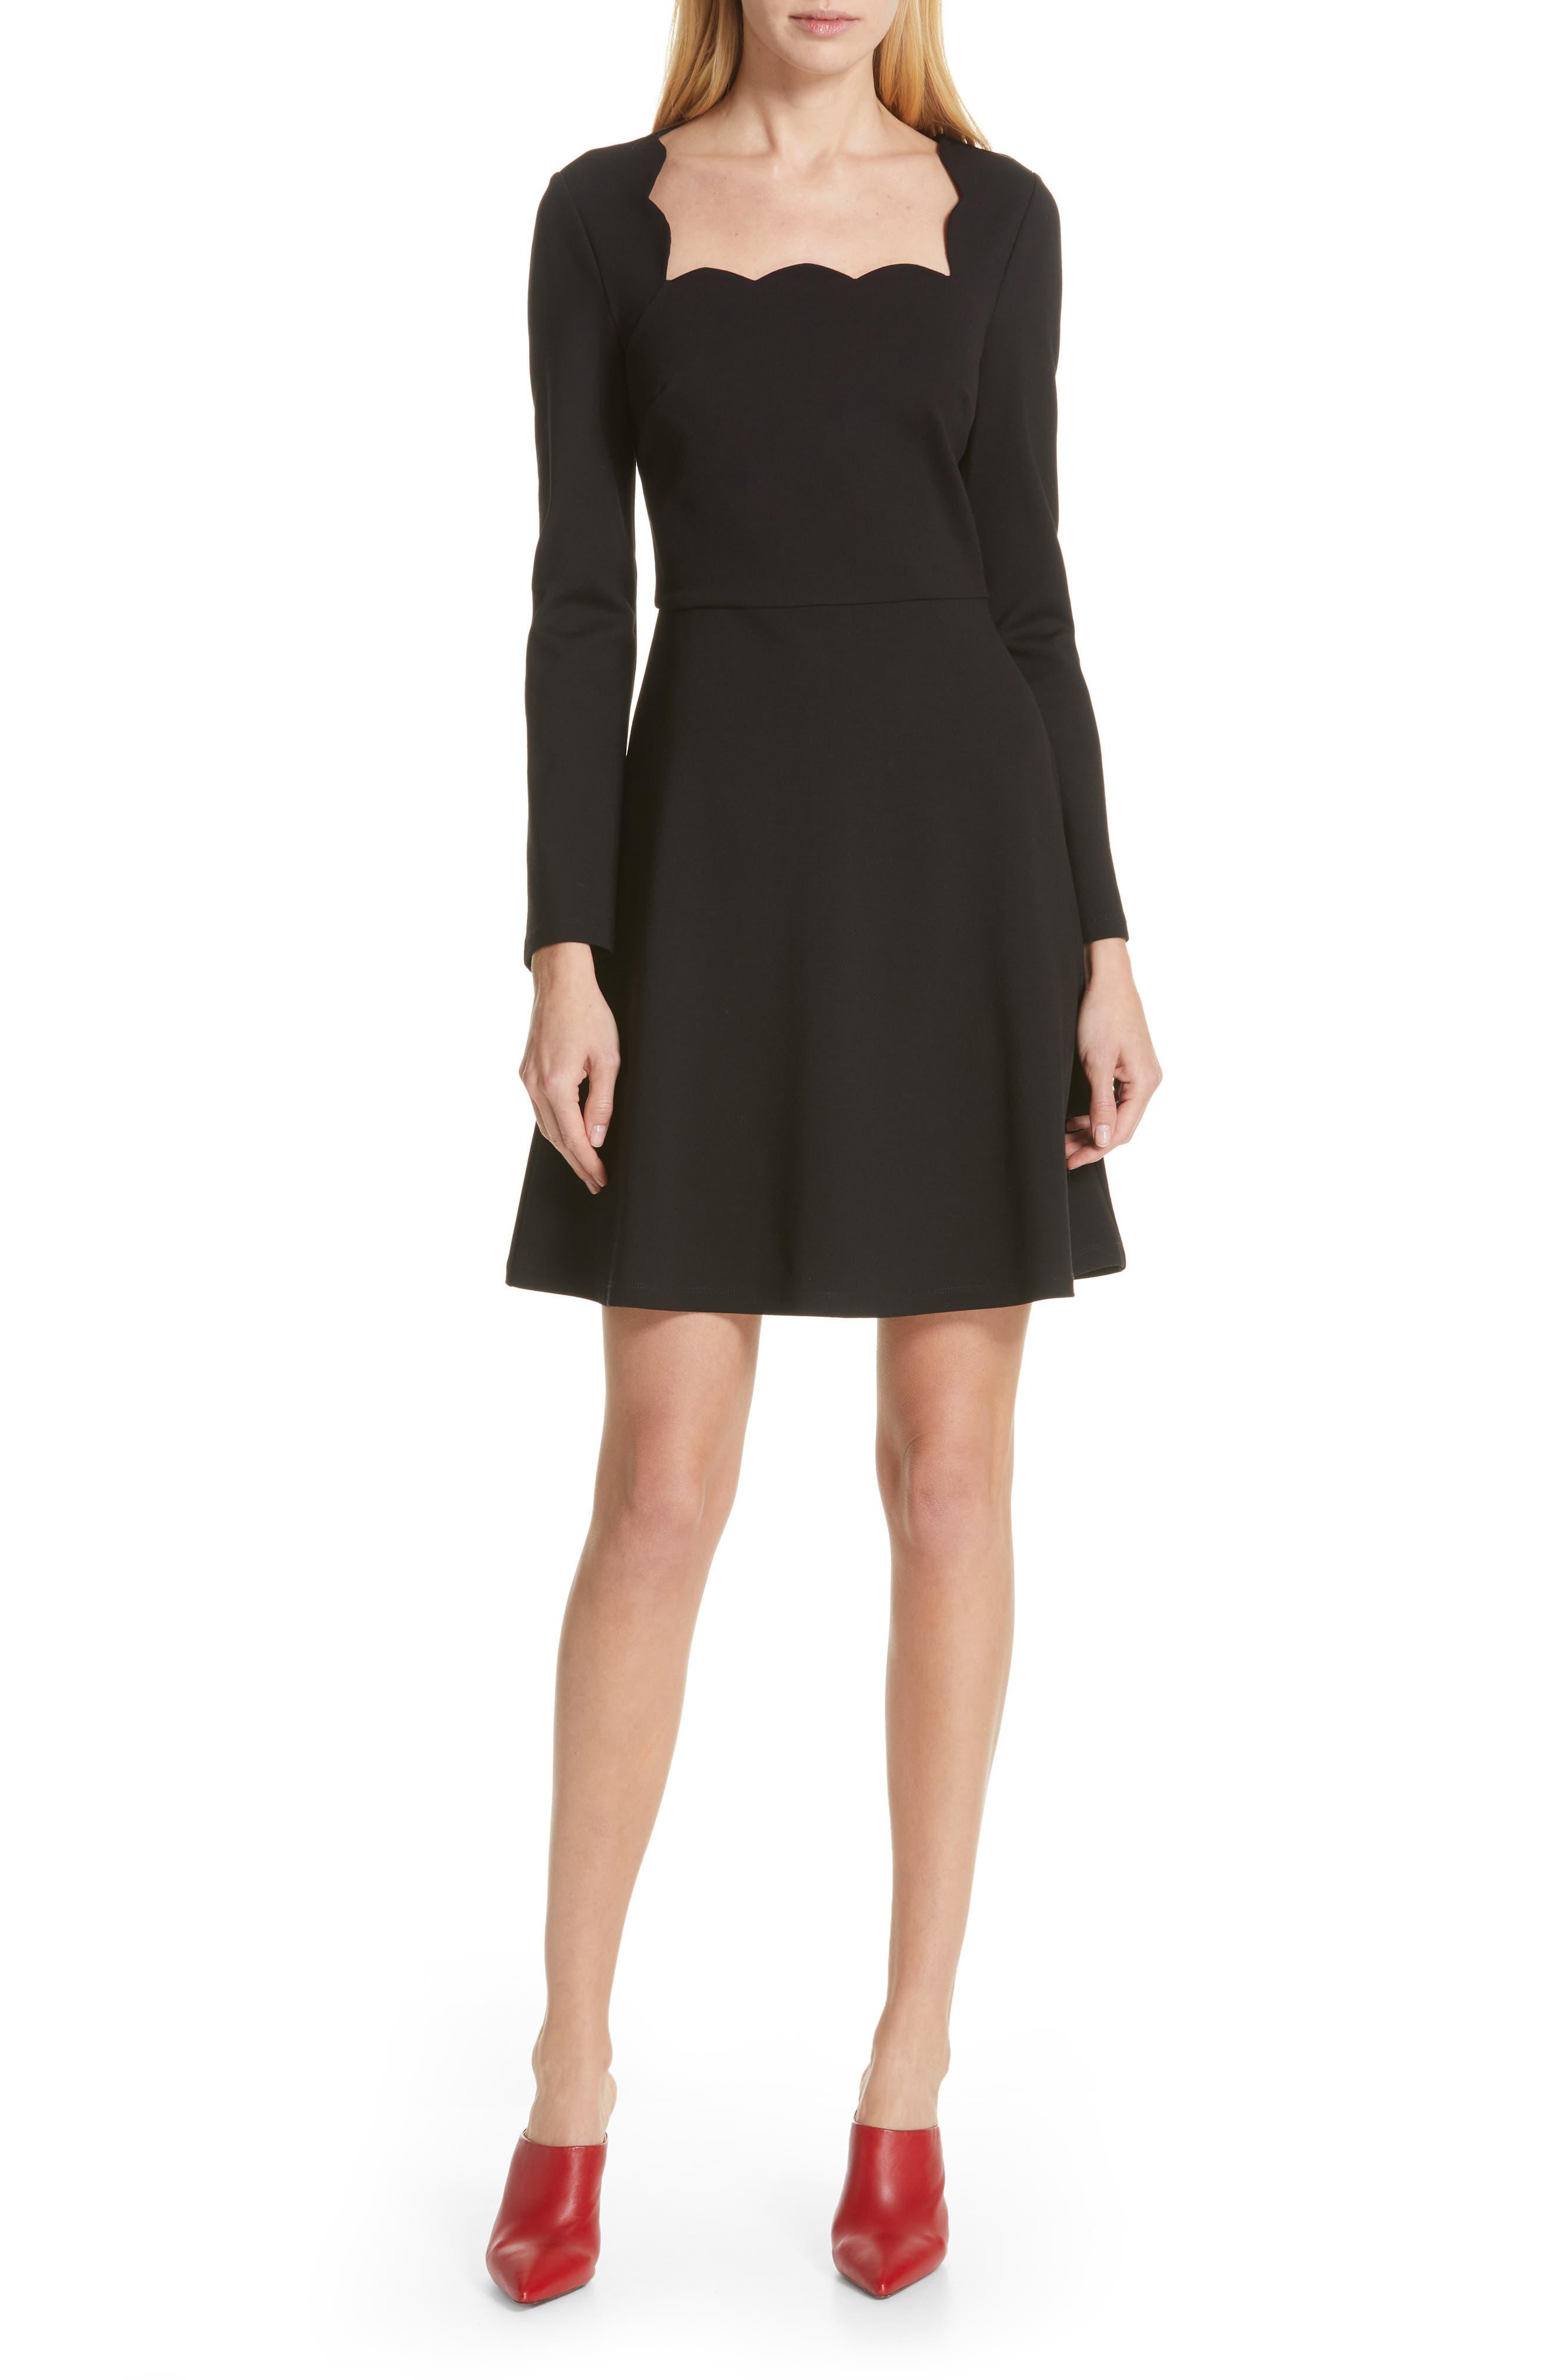 Kate Spade New York Scallop Ponte Fit & Flare Minidress, Black